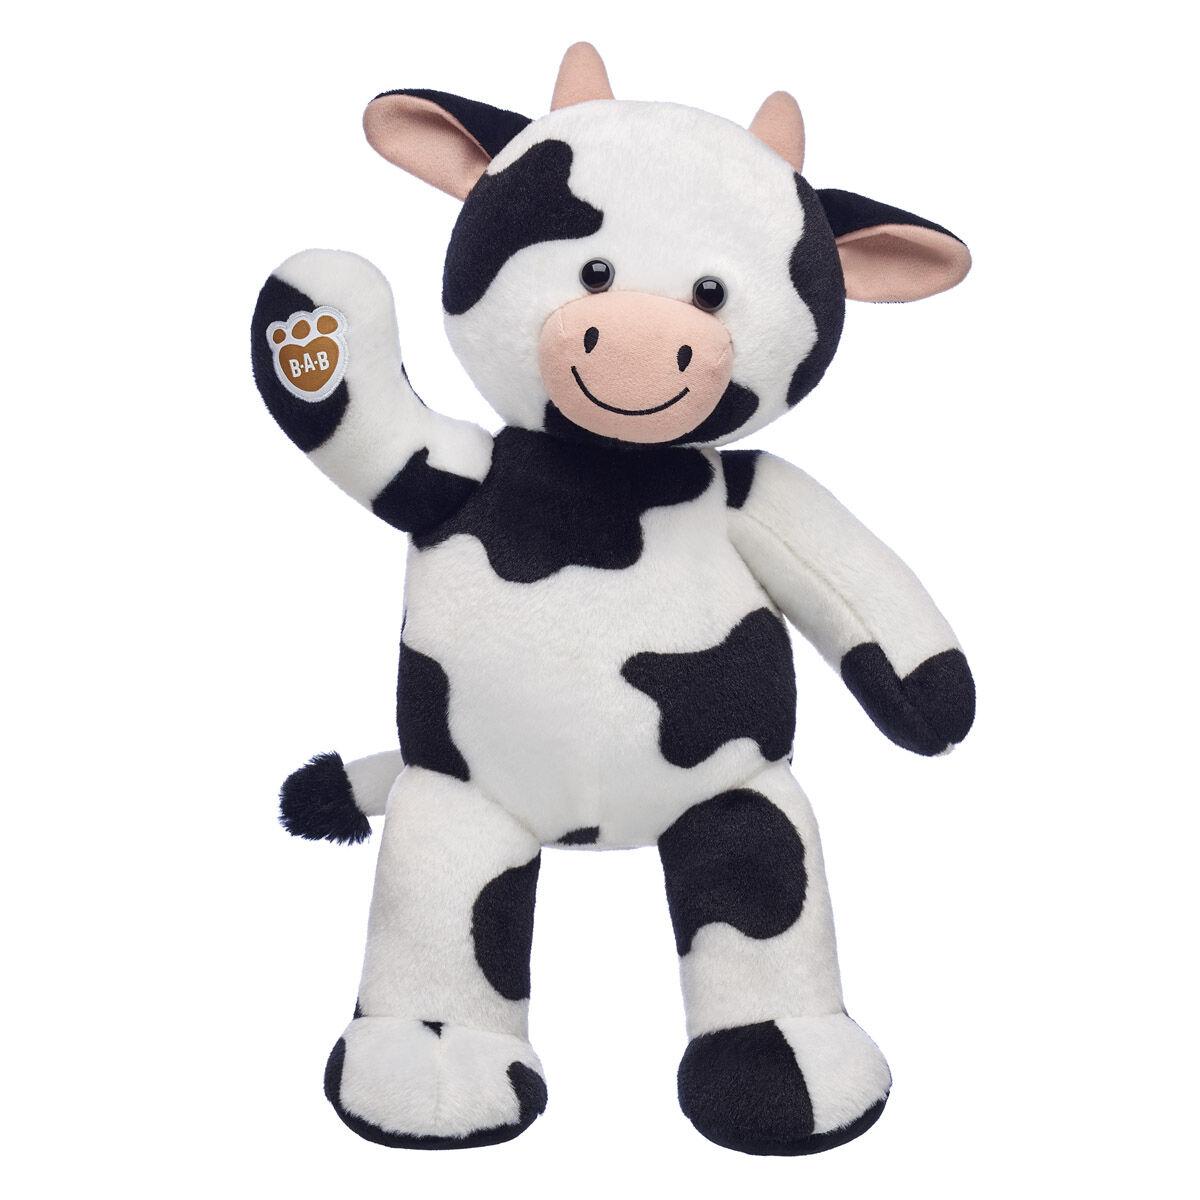 Cow Plush Teddy Black and White Kids Farm Animal Soft Newborn Baby Plush Toy UK